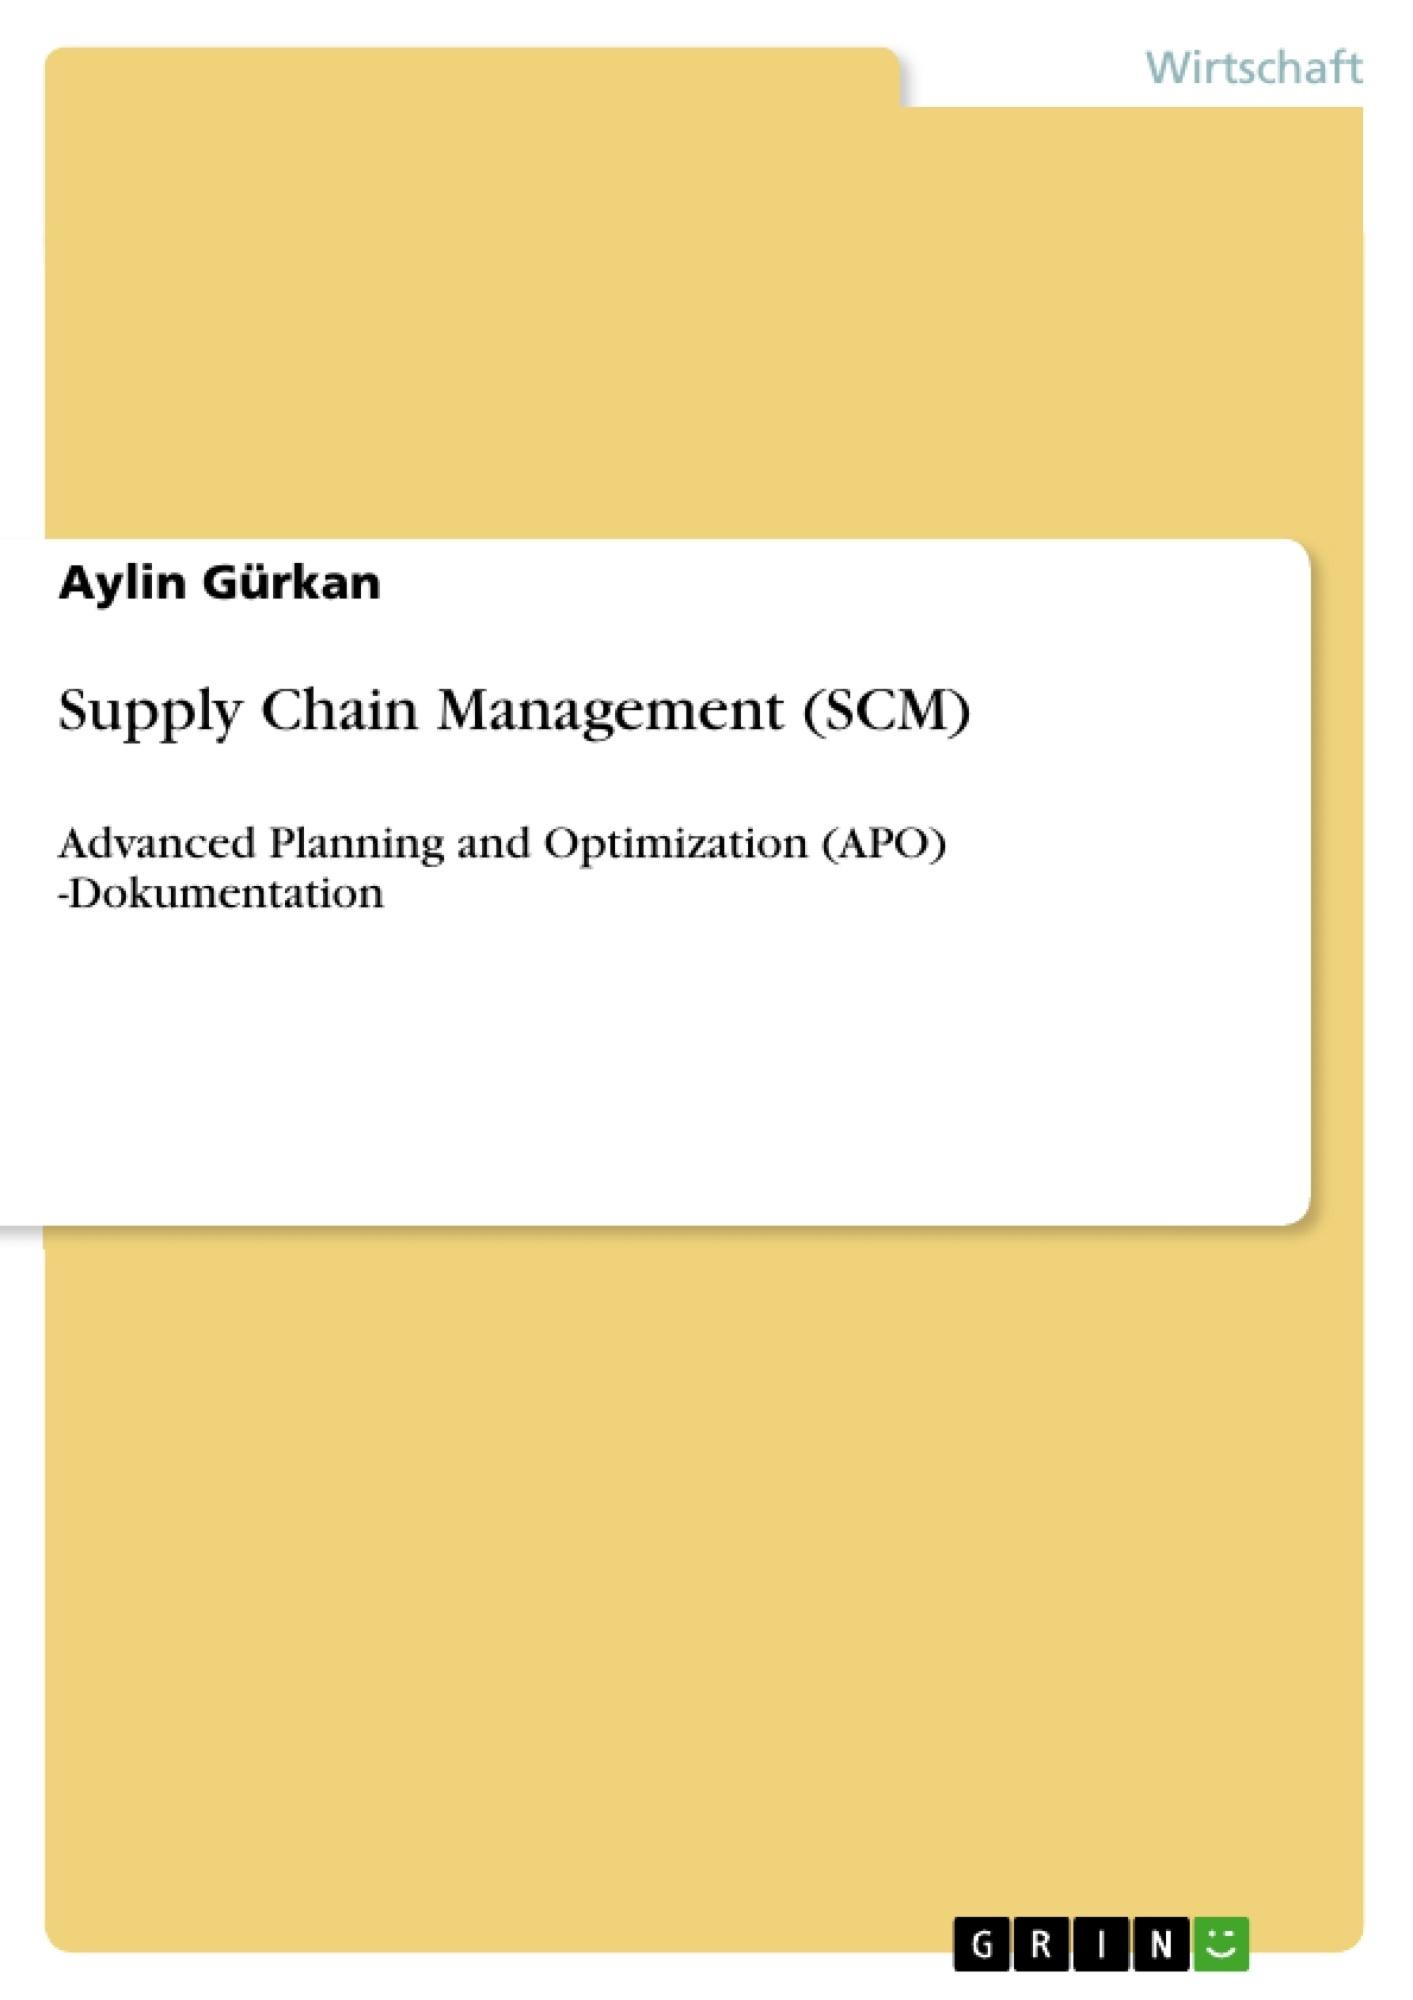 Titel: Supply Chain Management (SCM)